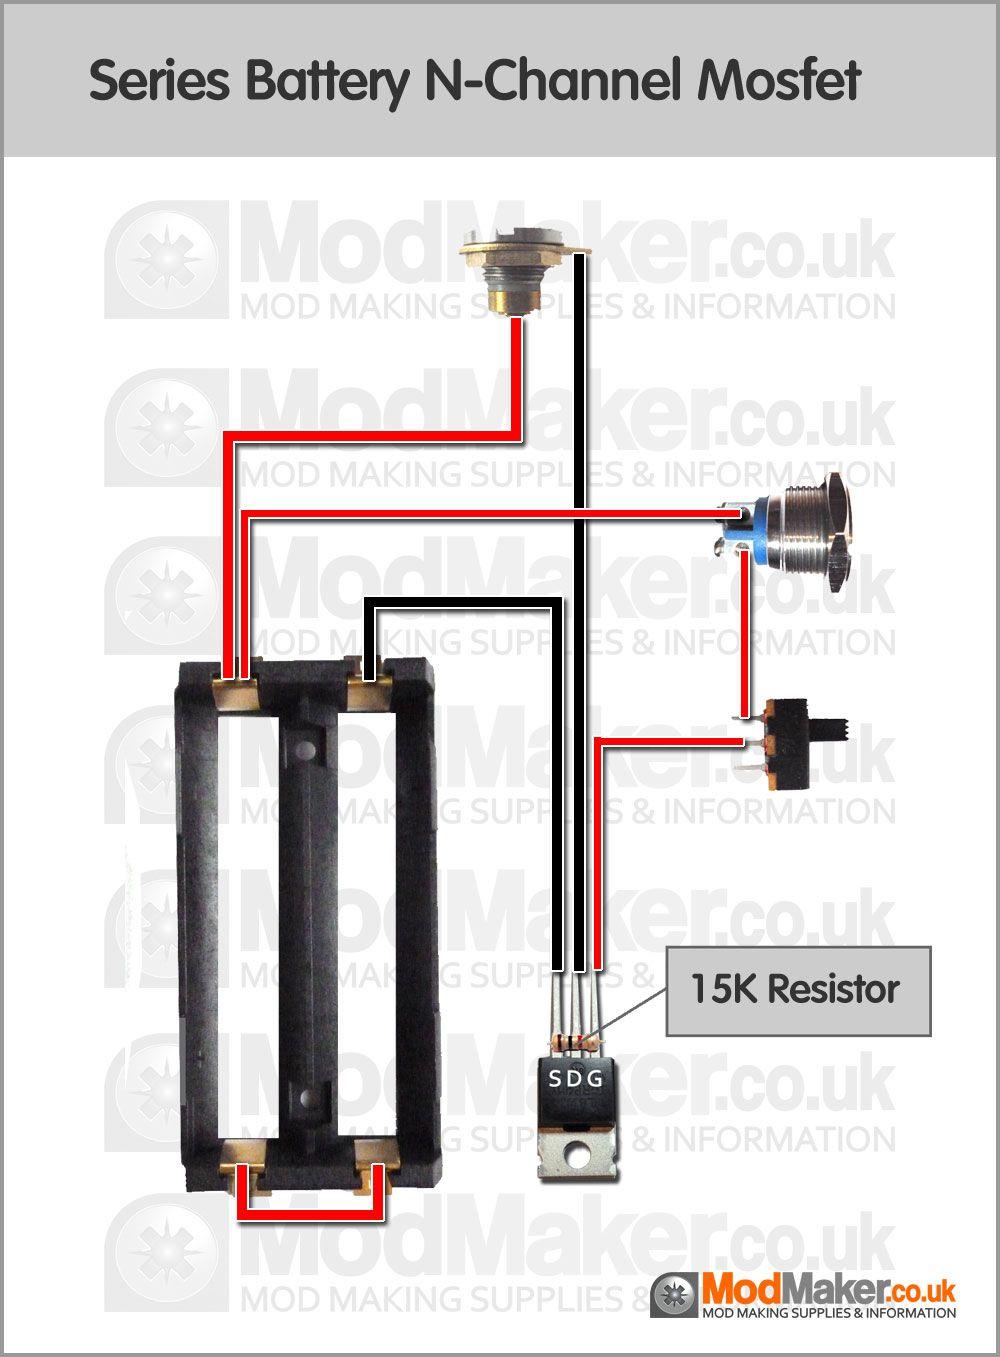 series battery n channel mosfet wiring diagram vaporized vapeseries battery n channel mosfet wiring diagram [ 1000 x 1357 Pixel ]